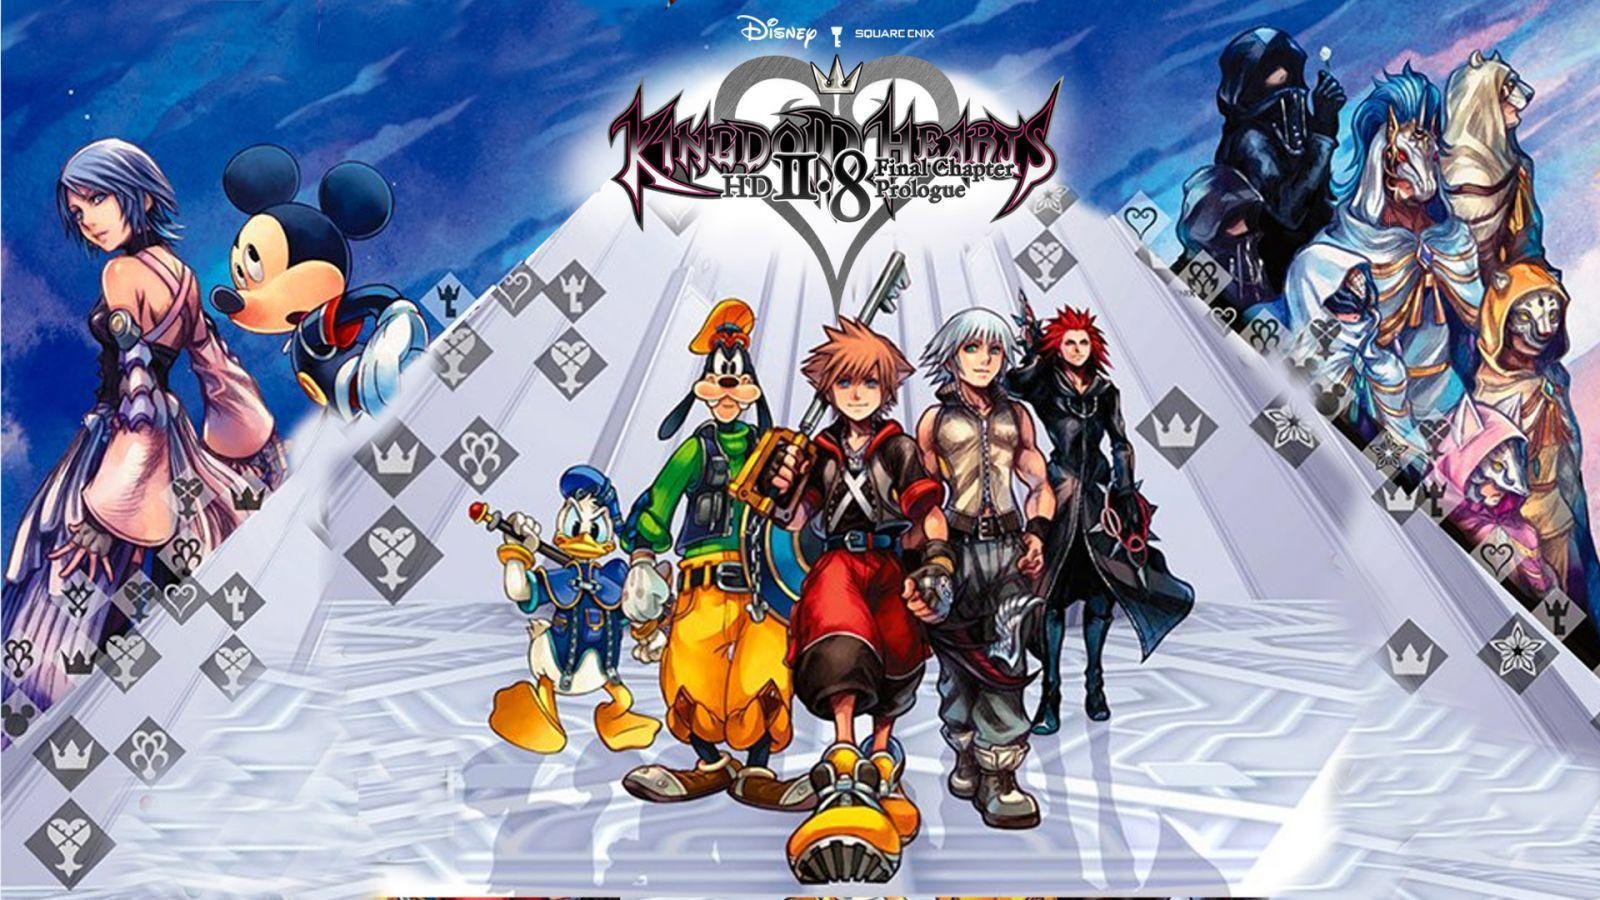 Kingdom Hearts 2 8 Wallpapers Top Free Kingdom Hearts 2 8